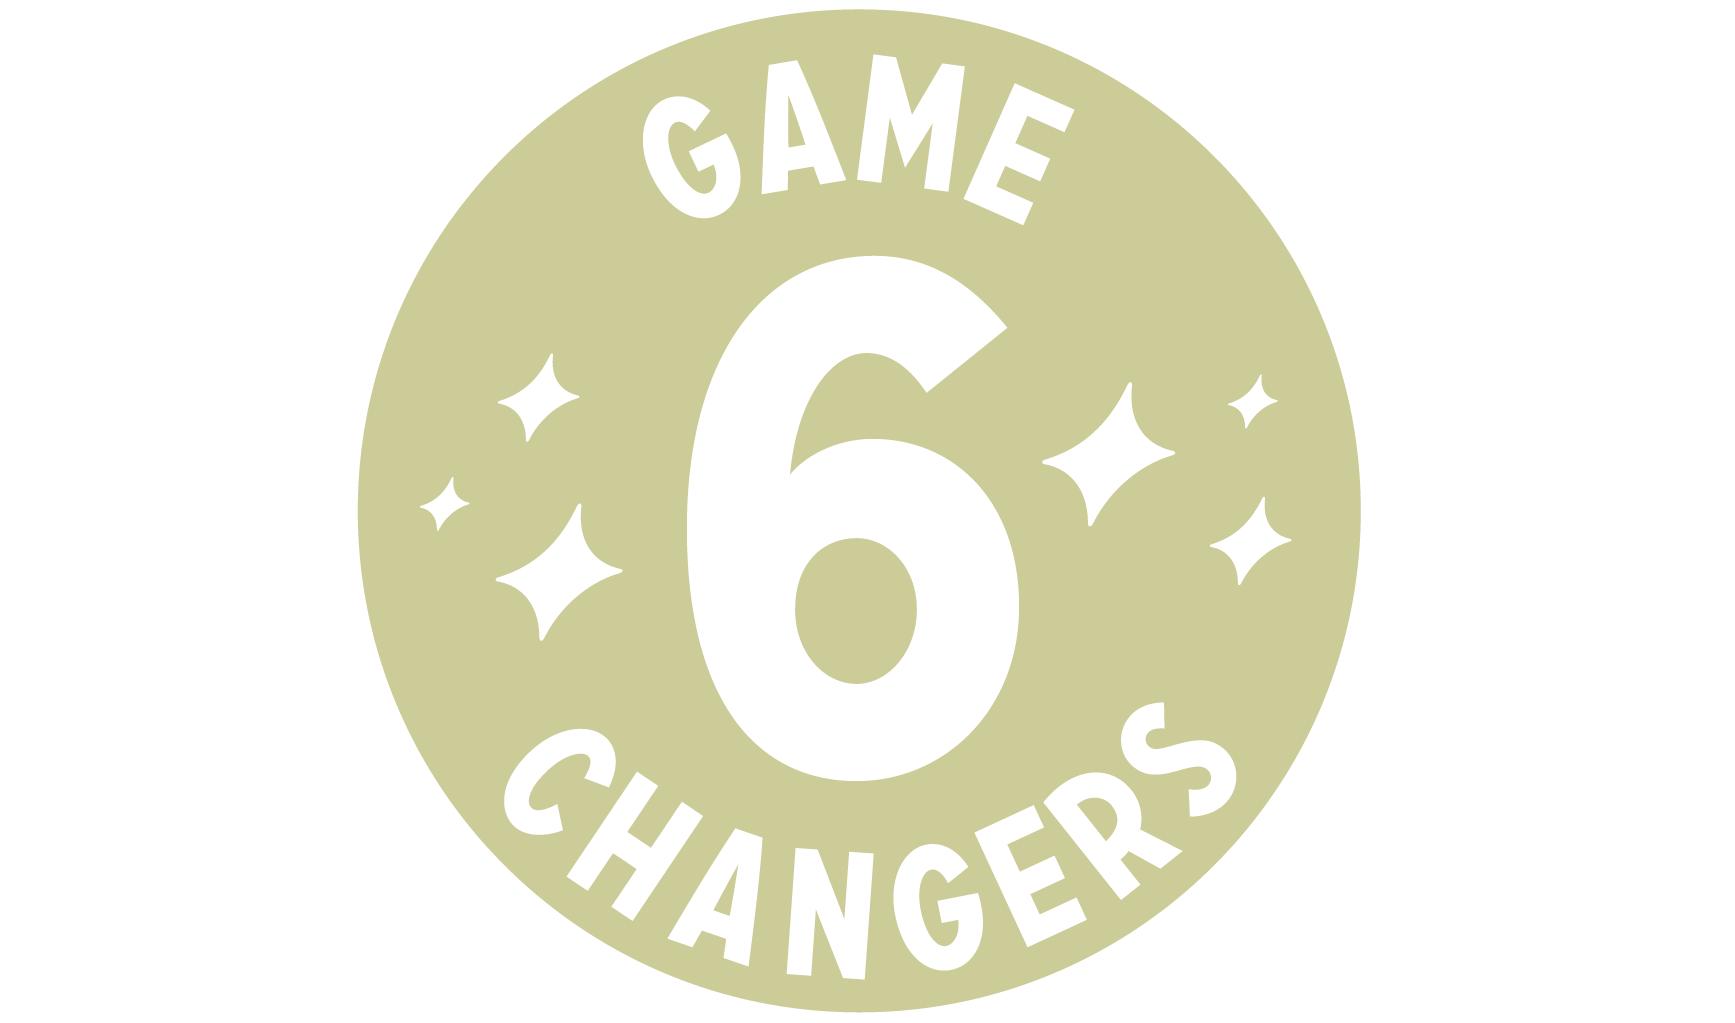 Jacksonville-3-BallparkMagic_GameChangers.png